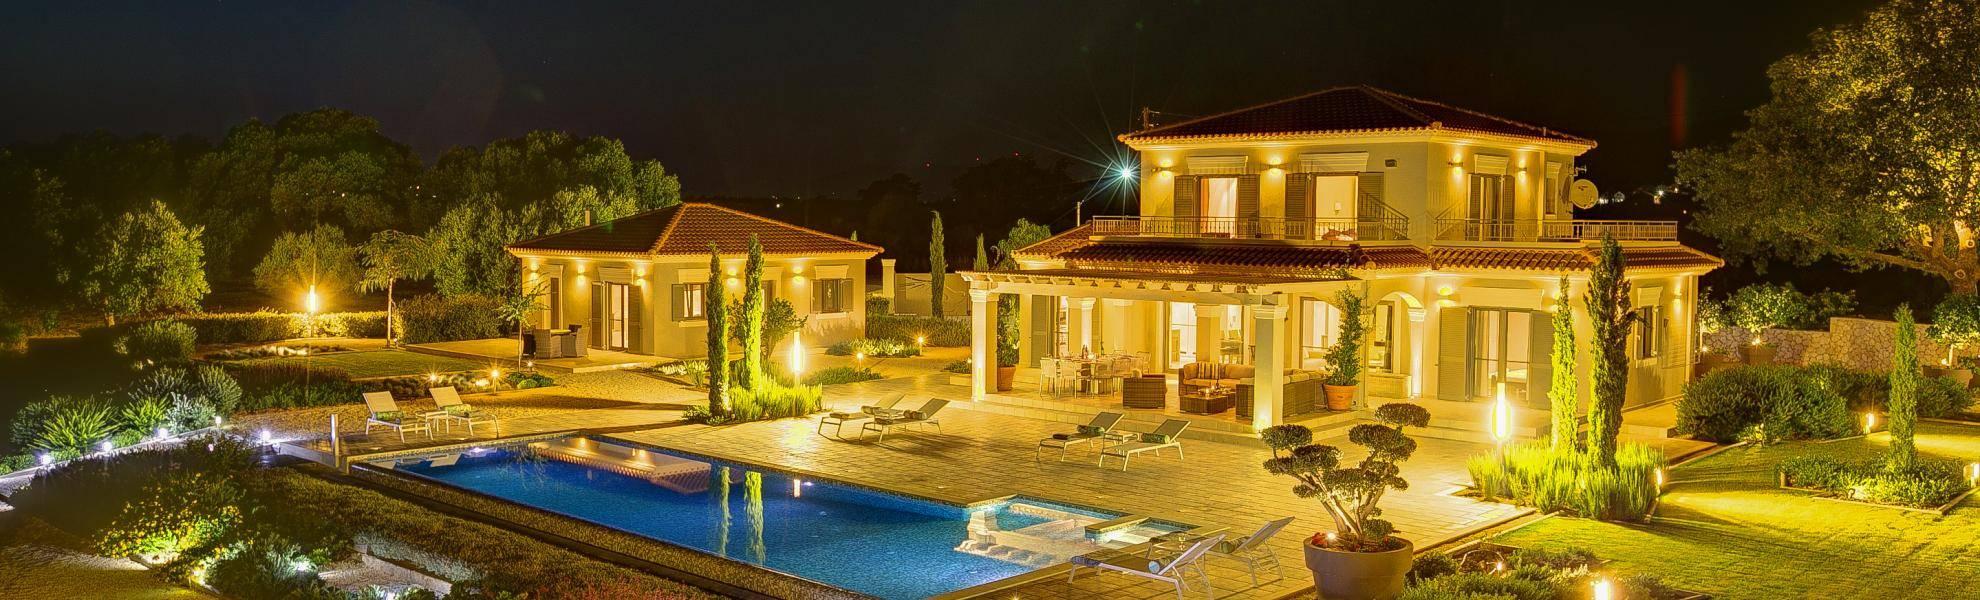 Villa Pelagio